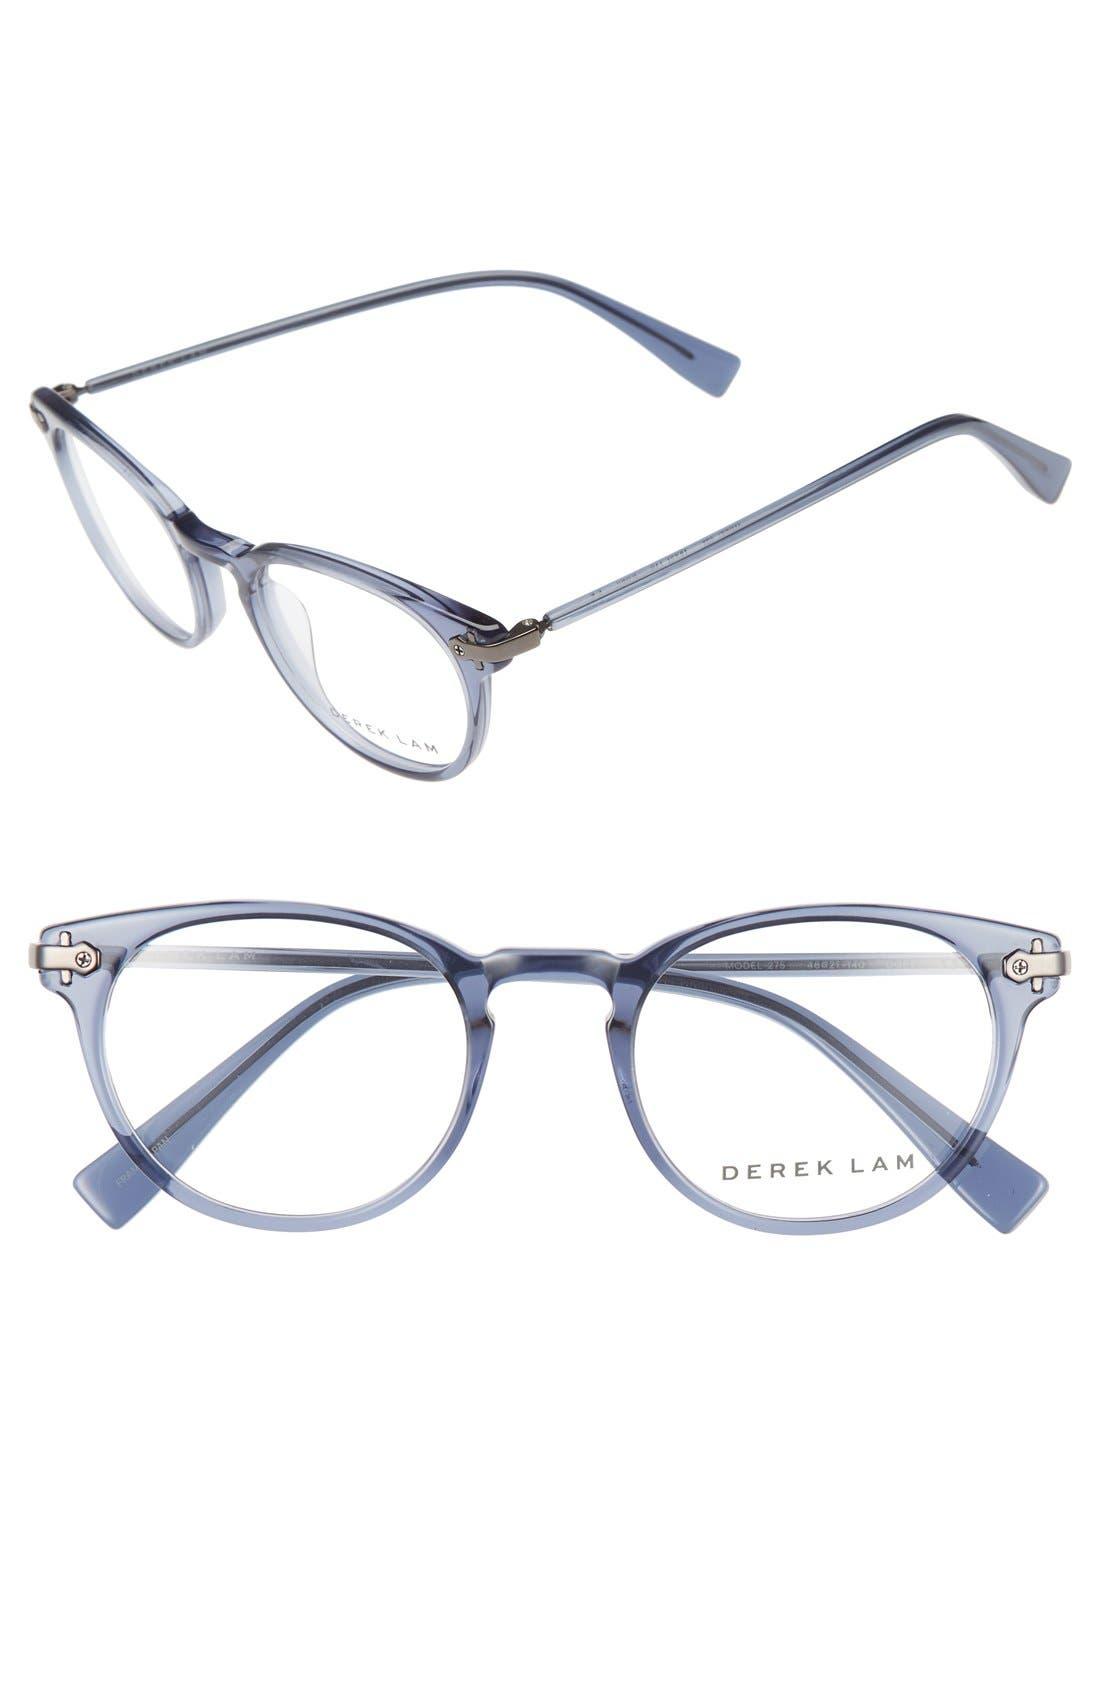 48mm Optical Glasses,                             Main thumbnail 1, color,                             020